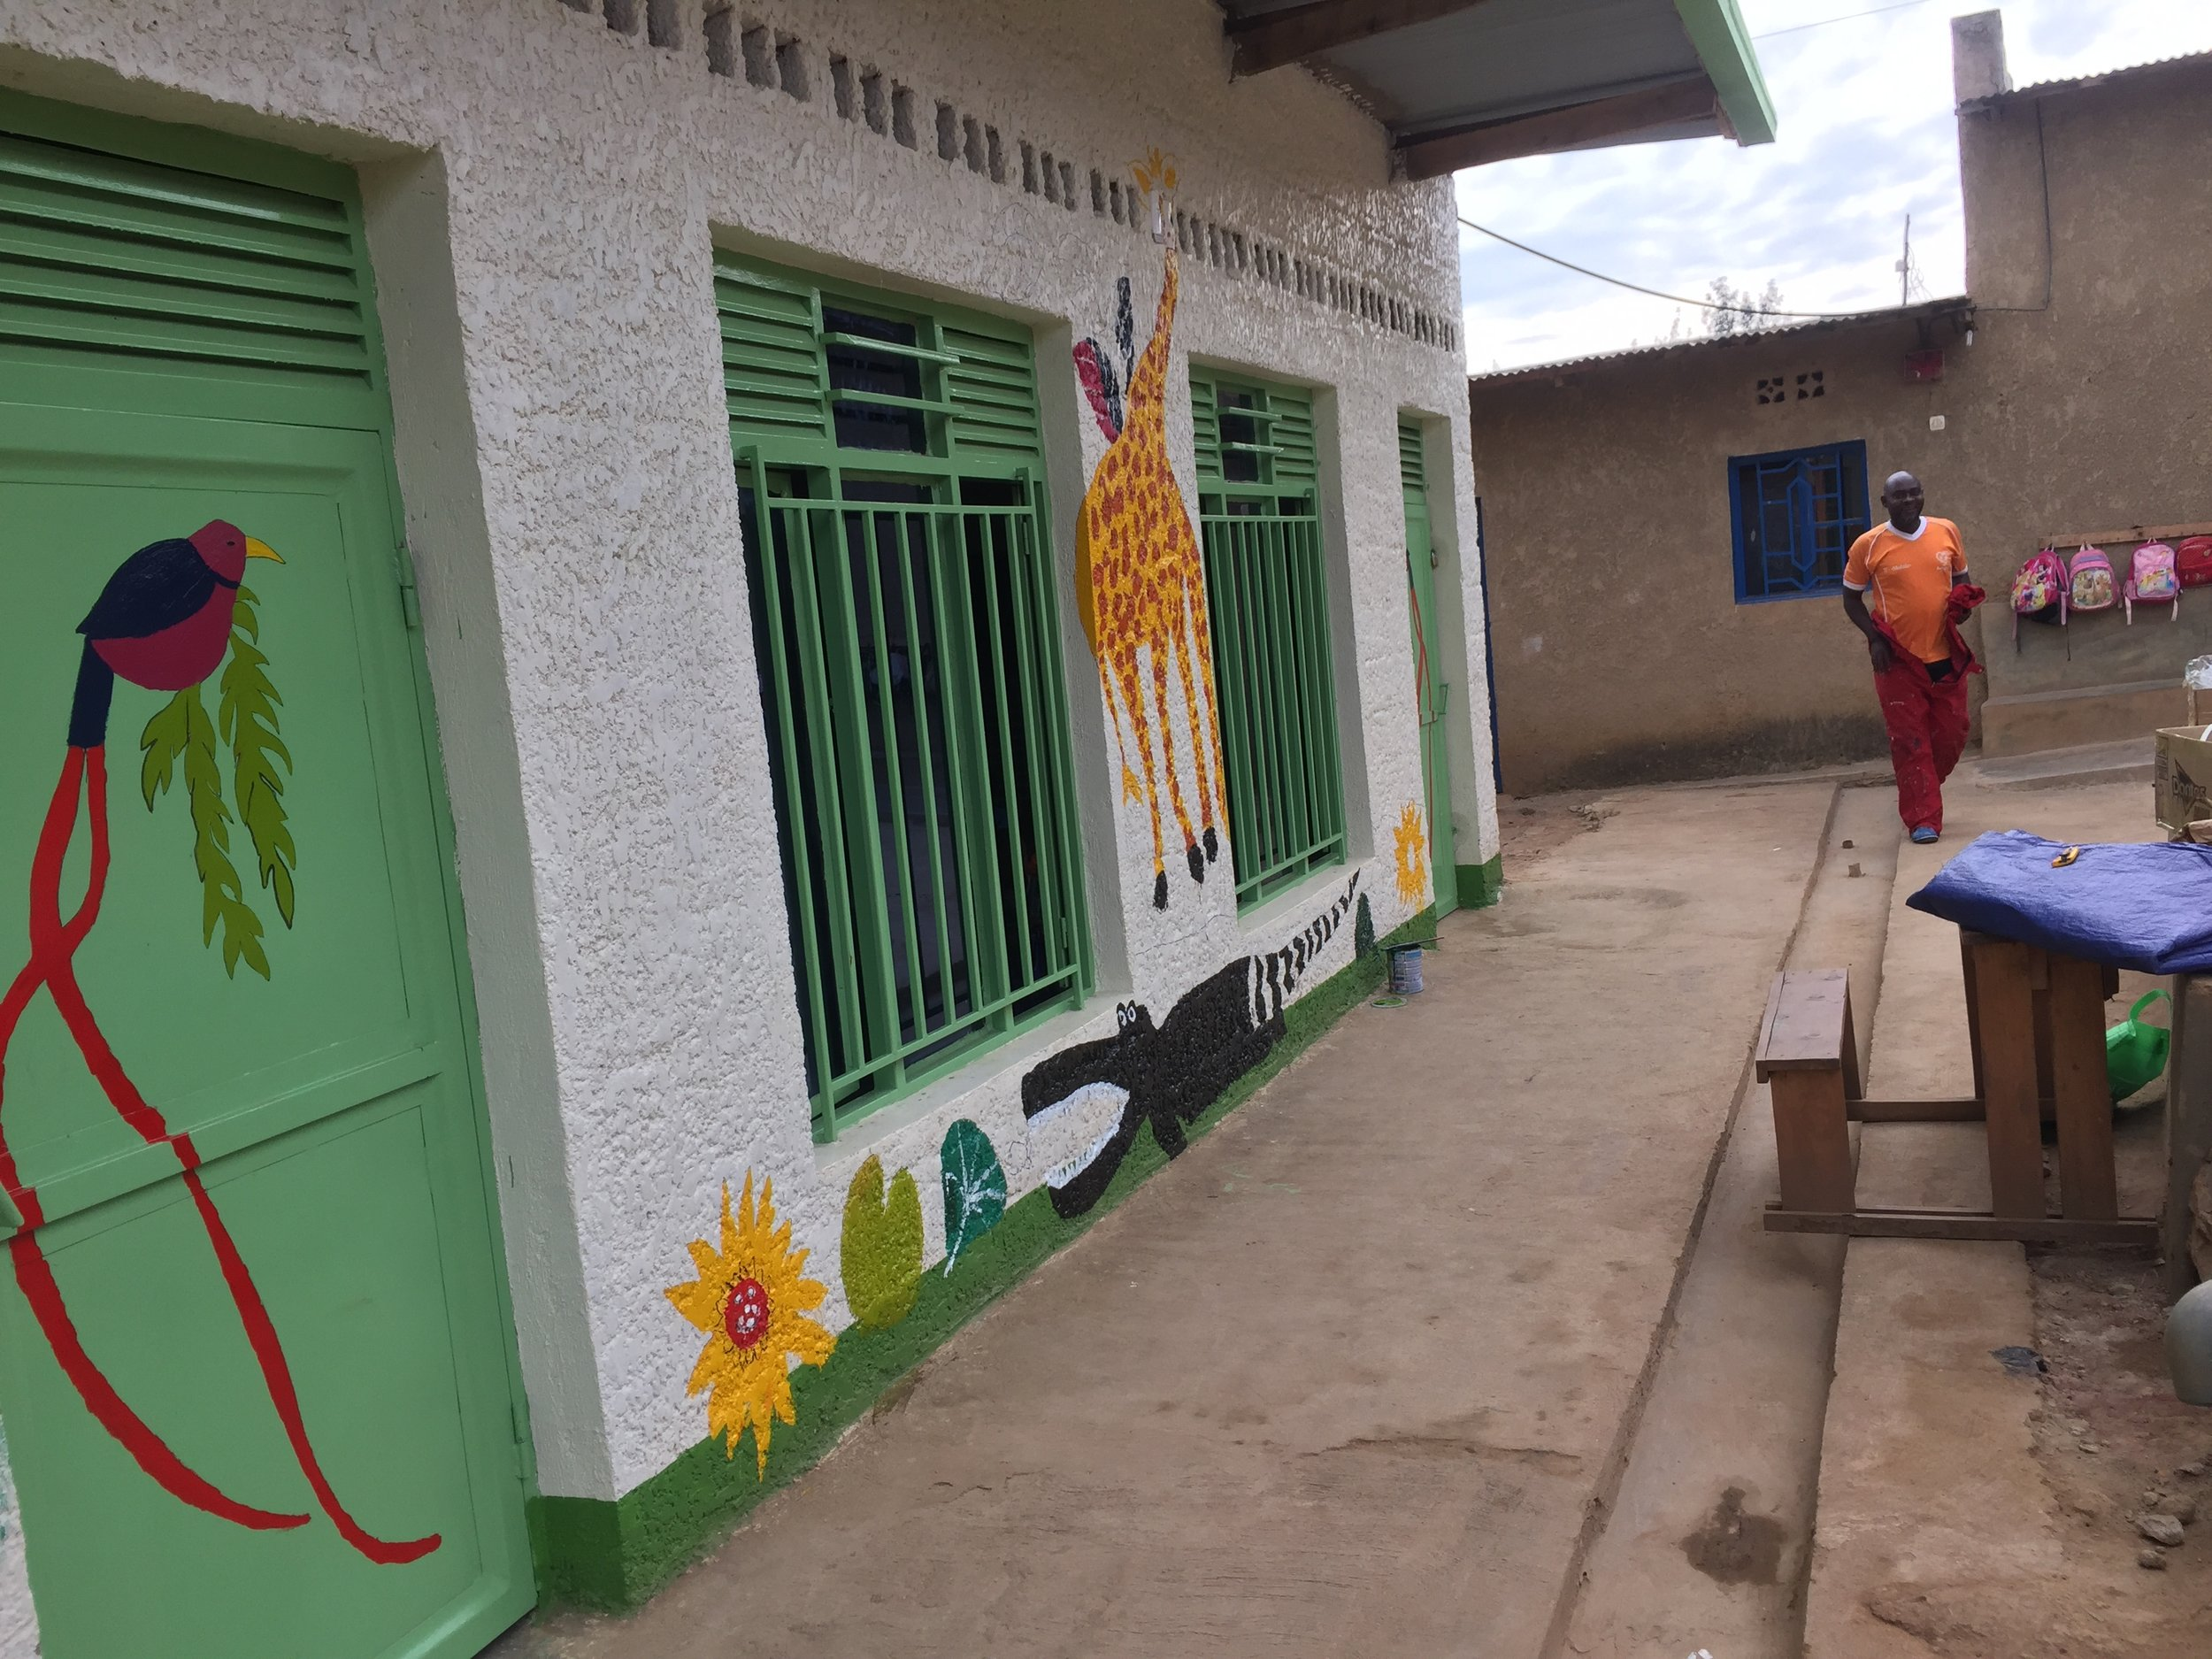 Classroom exterior with murals